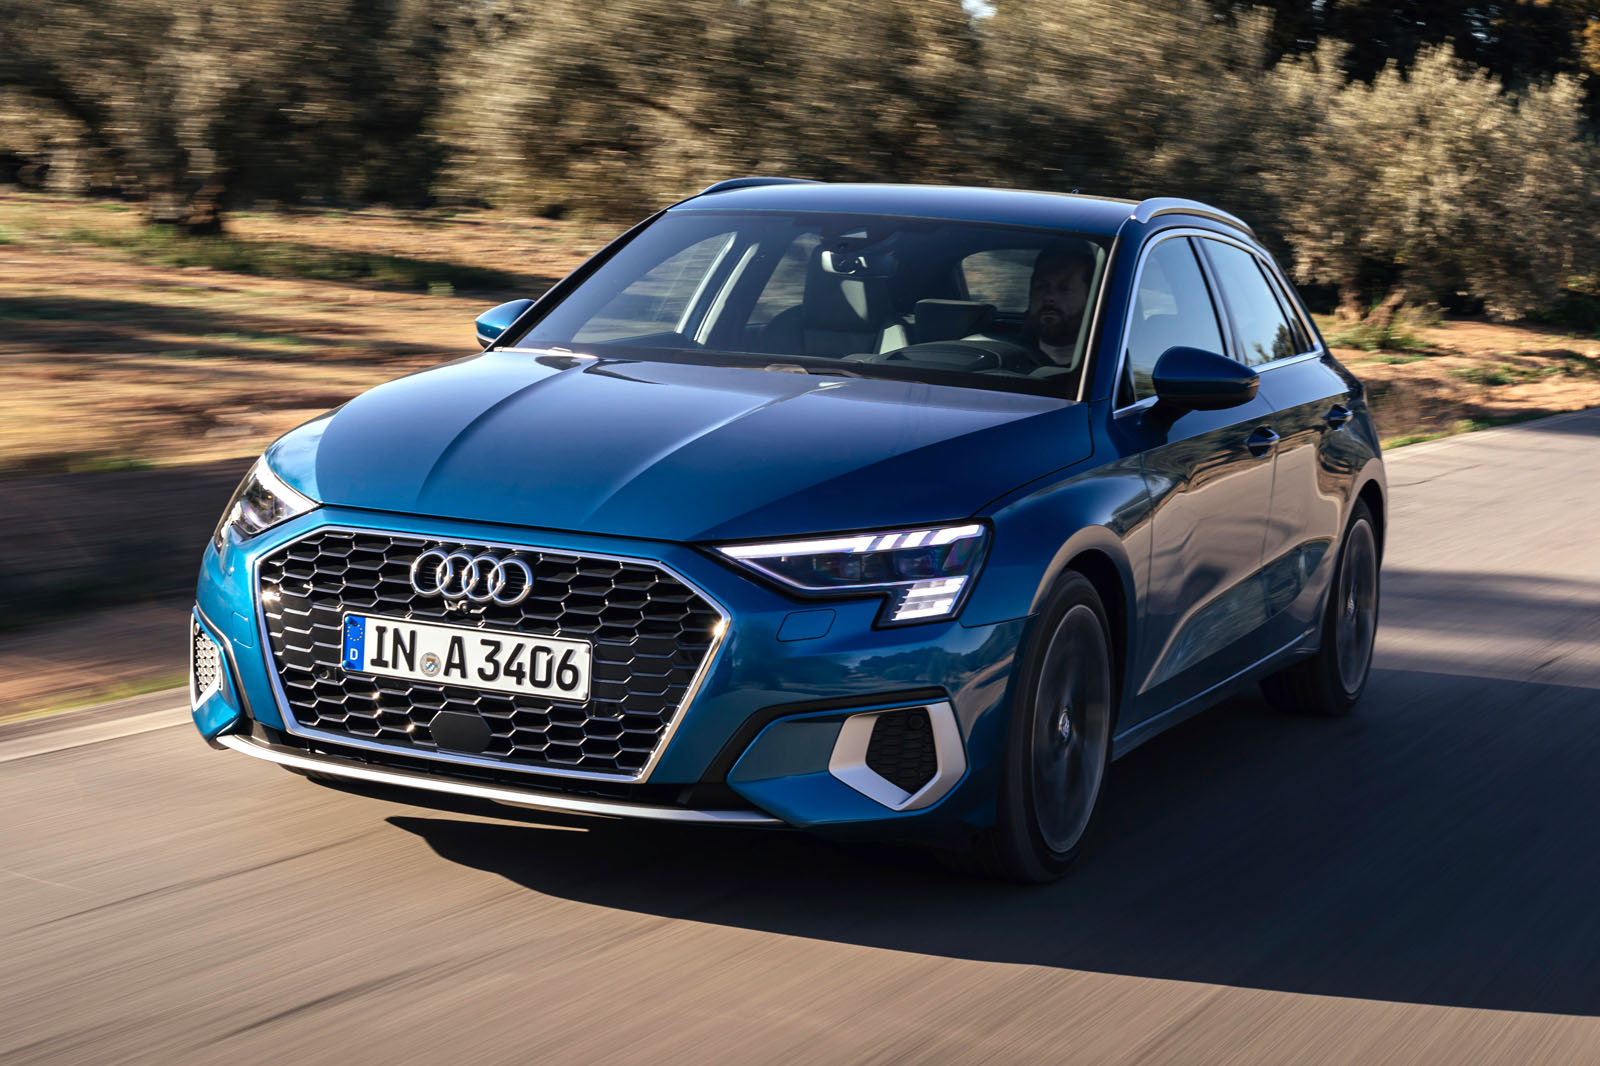 Audi A3 Sportback Business Line >> Audi A3 Sportback 35 TDI S tronic S line 2020 review   Autocar